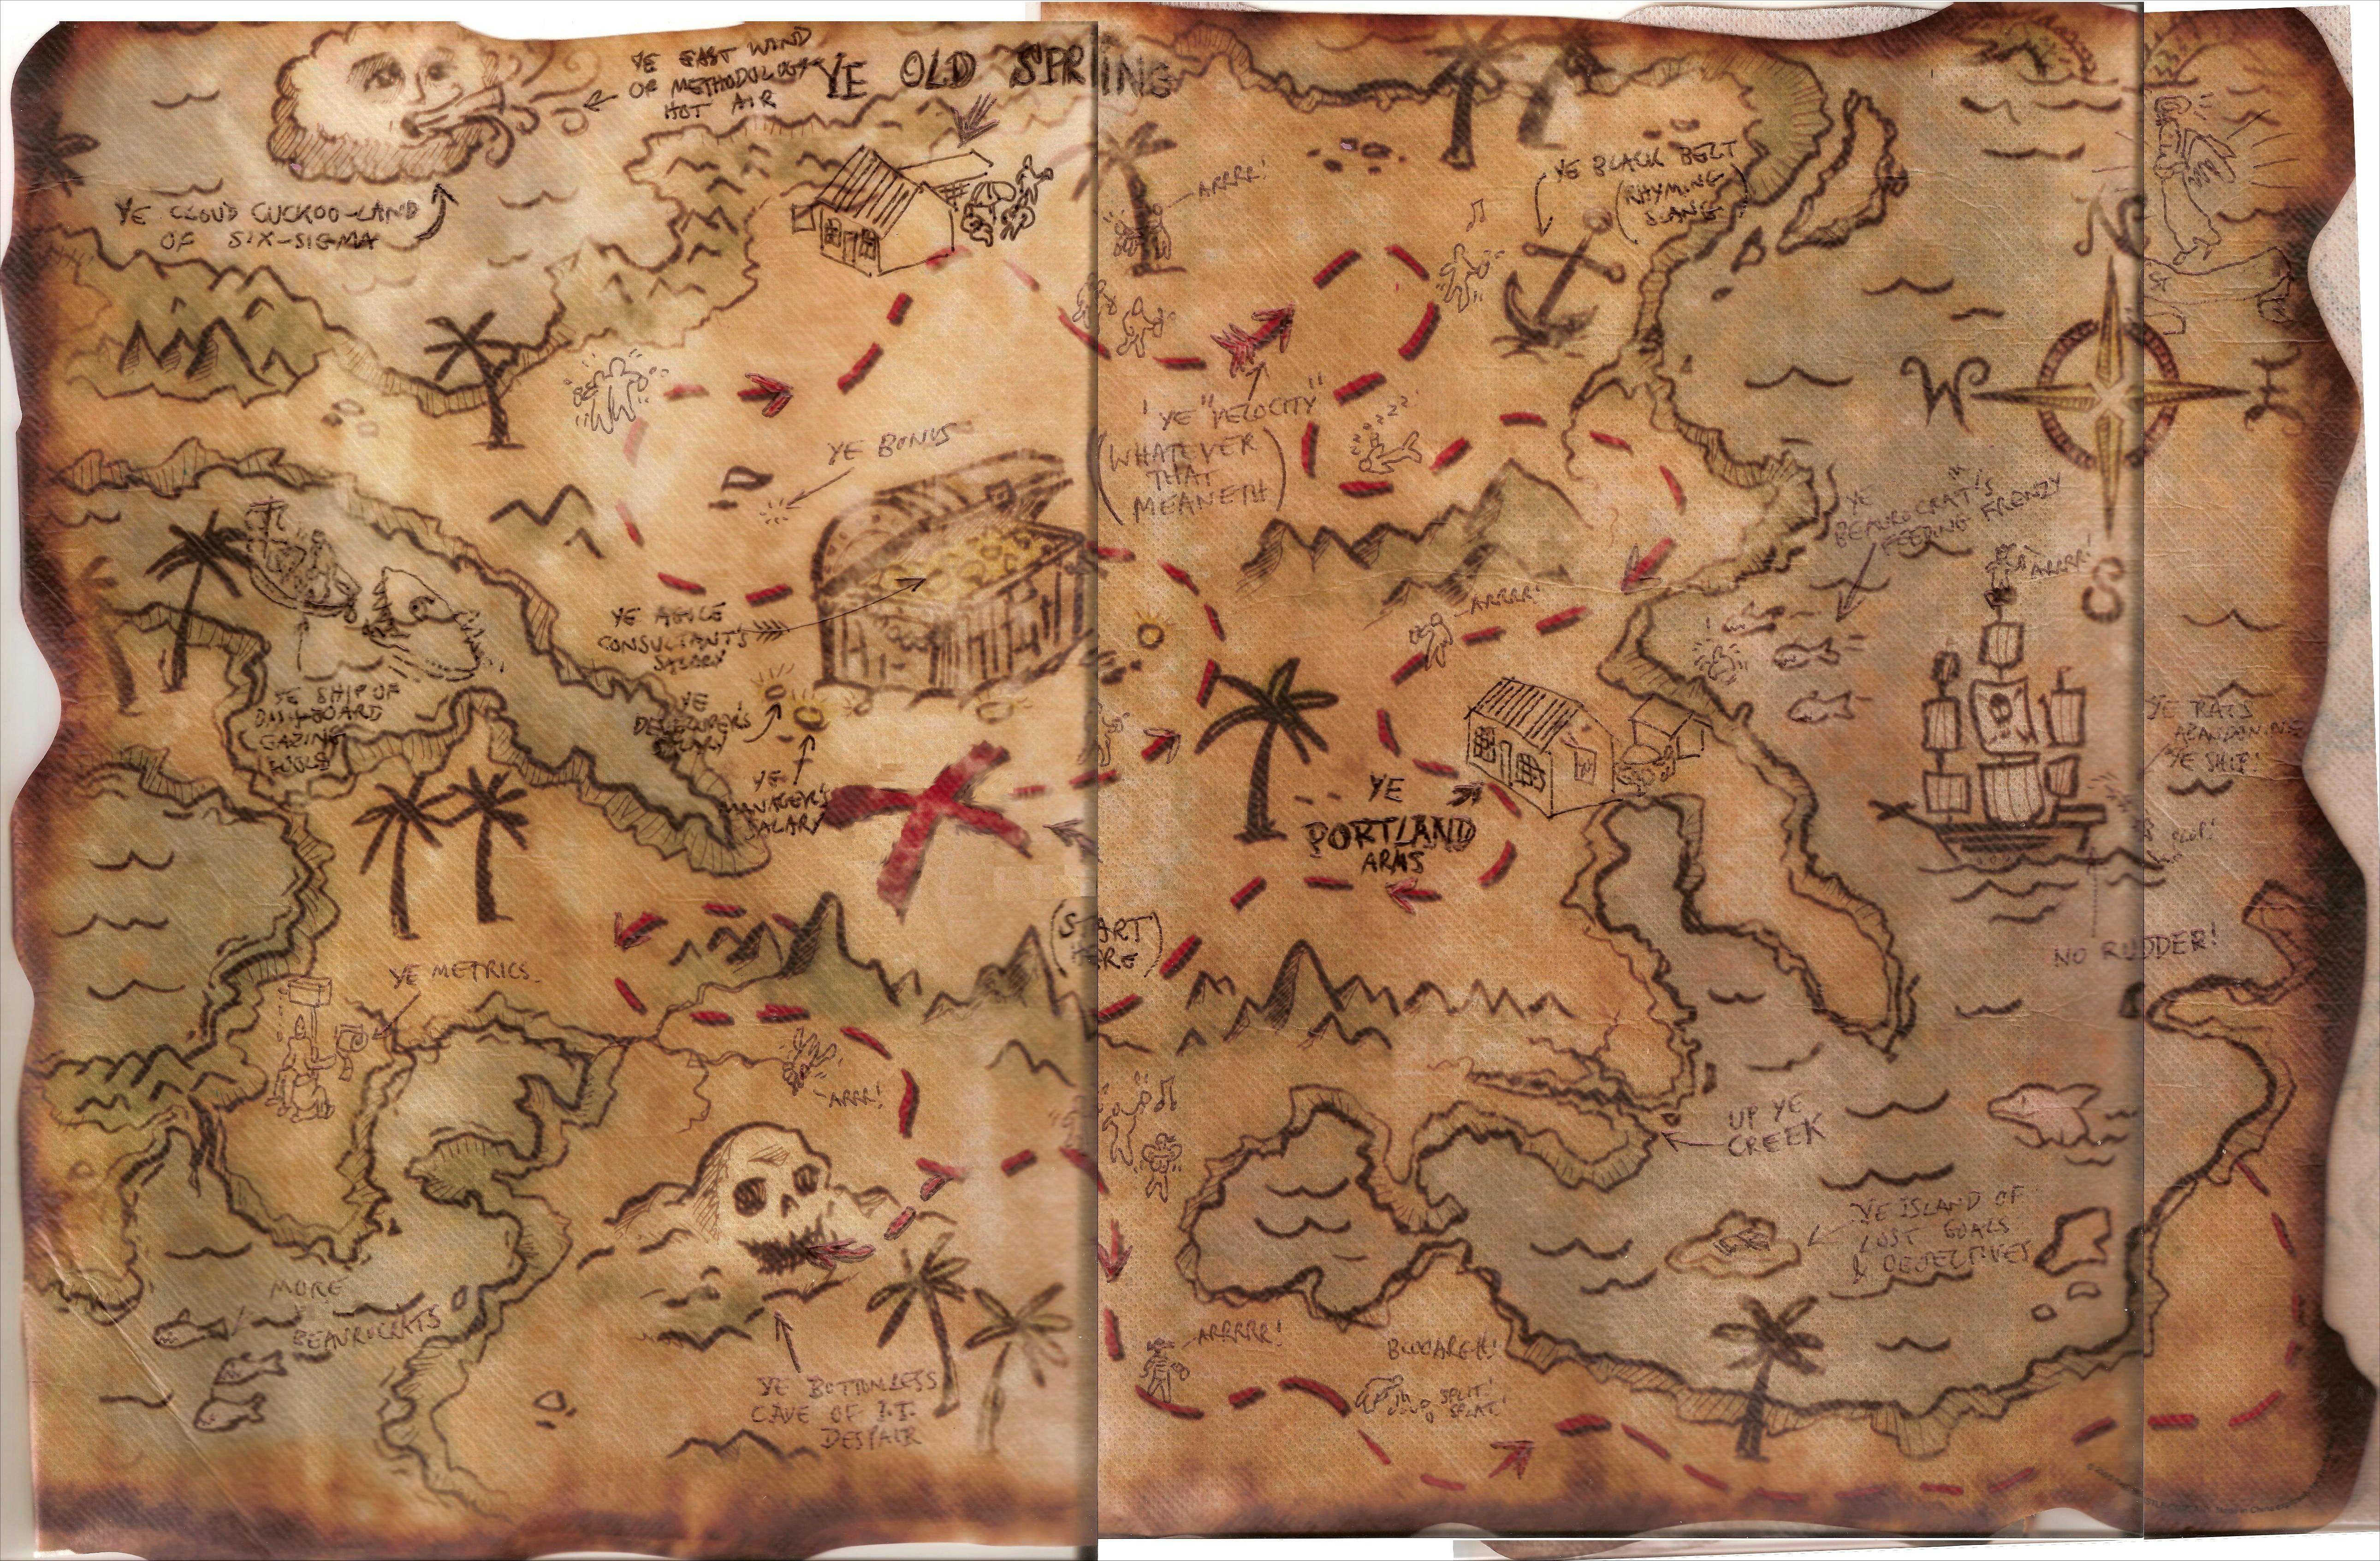 Real Treasure Maps arr_treasure_small | Treasure Map Examples in 2019 | Pirate maps